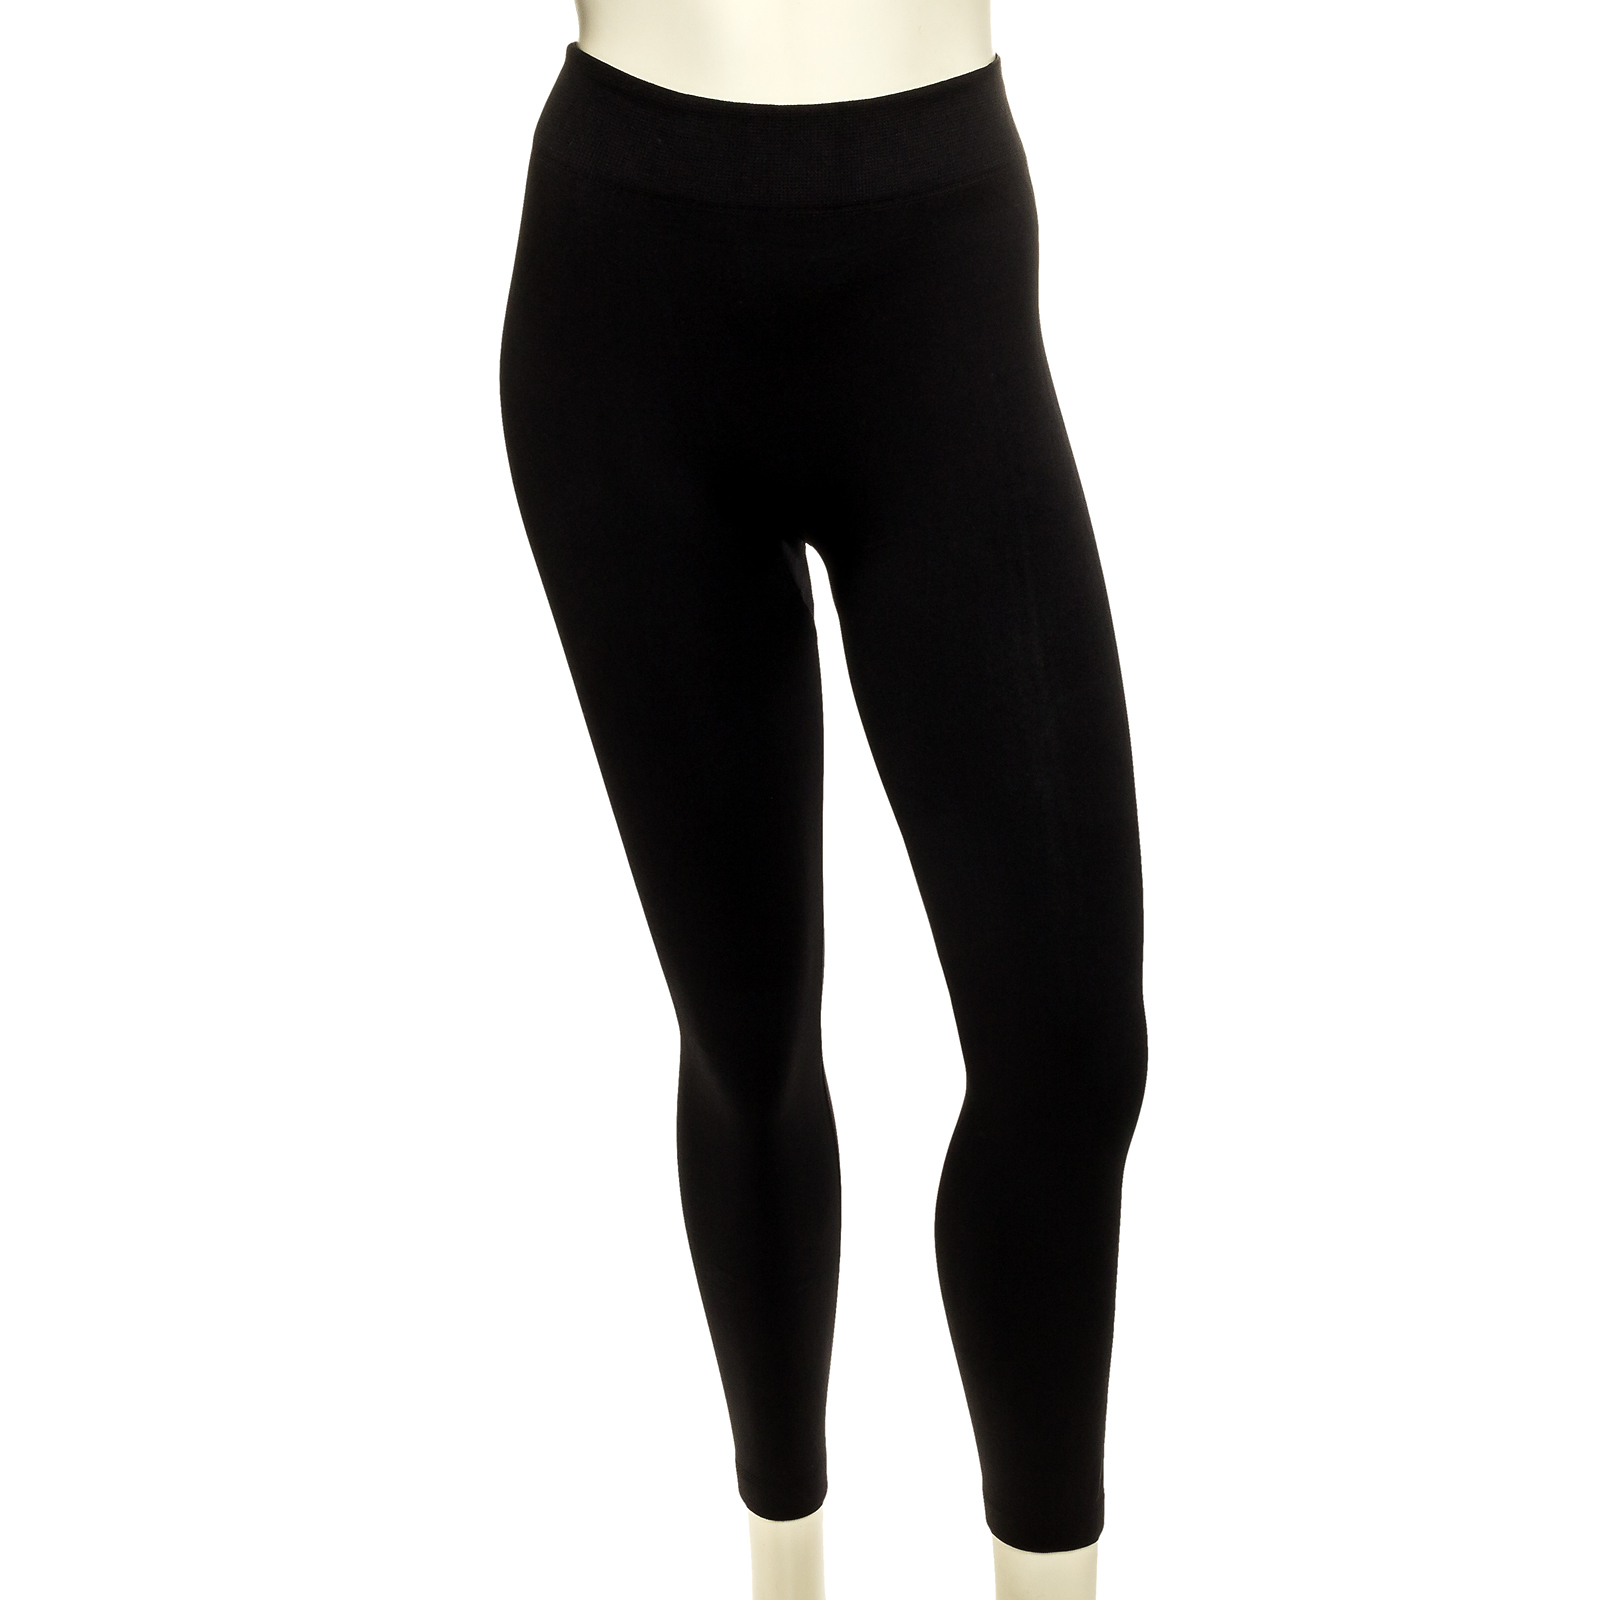 Yelete Womens Fleece Lined Seamless Leggings (Black, One Size) at Sears.com